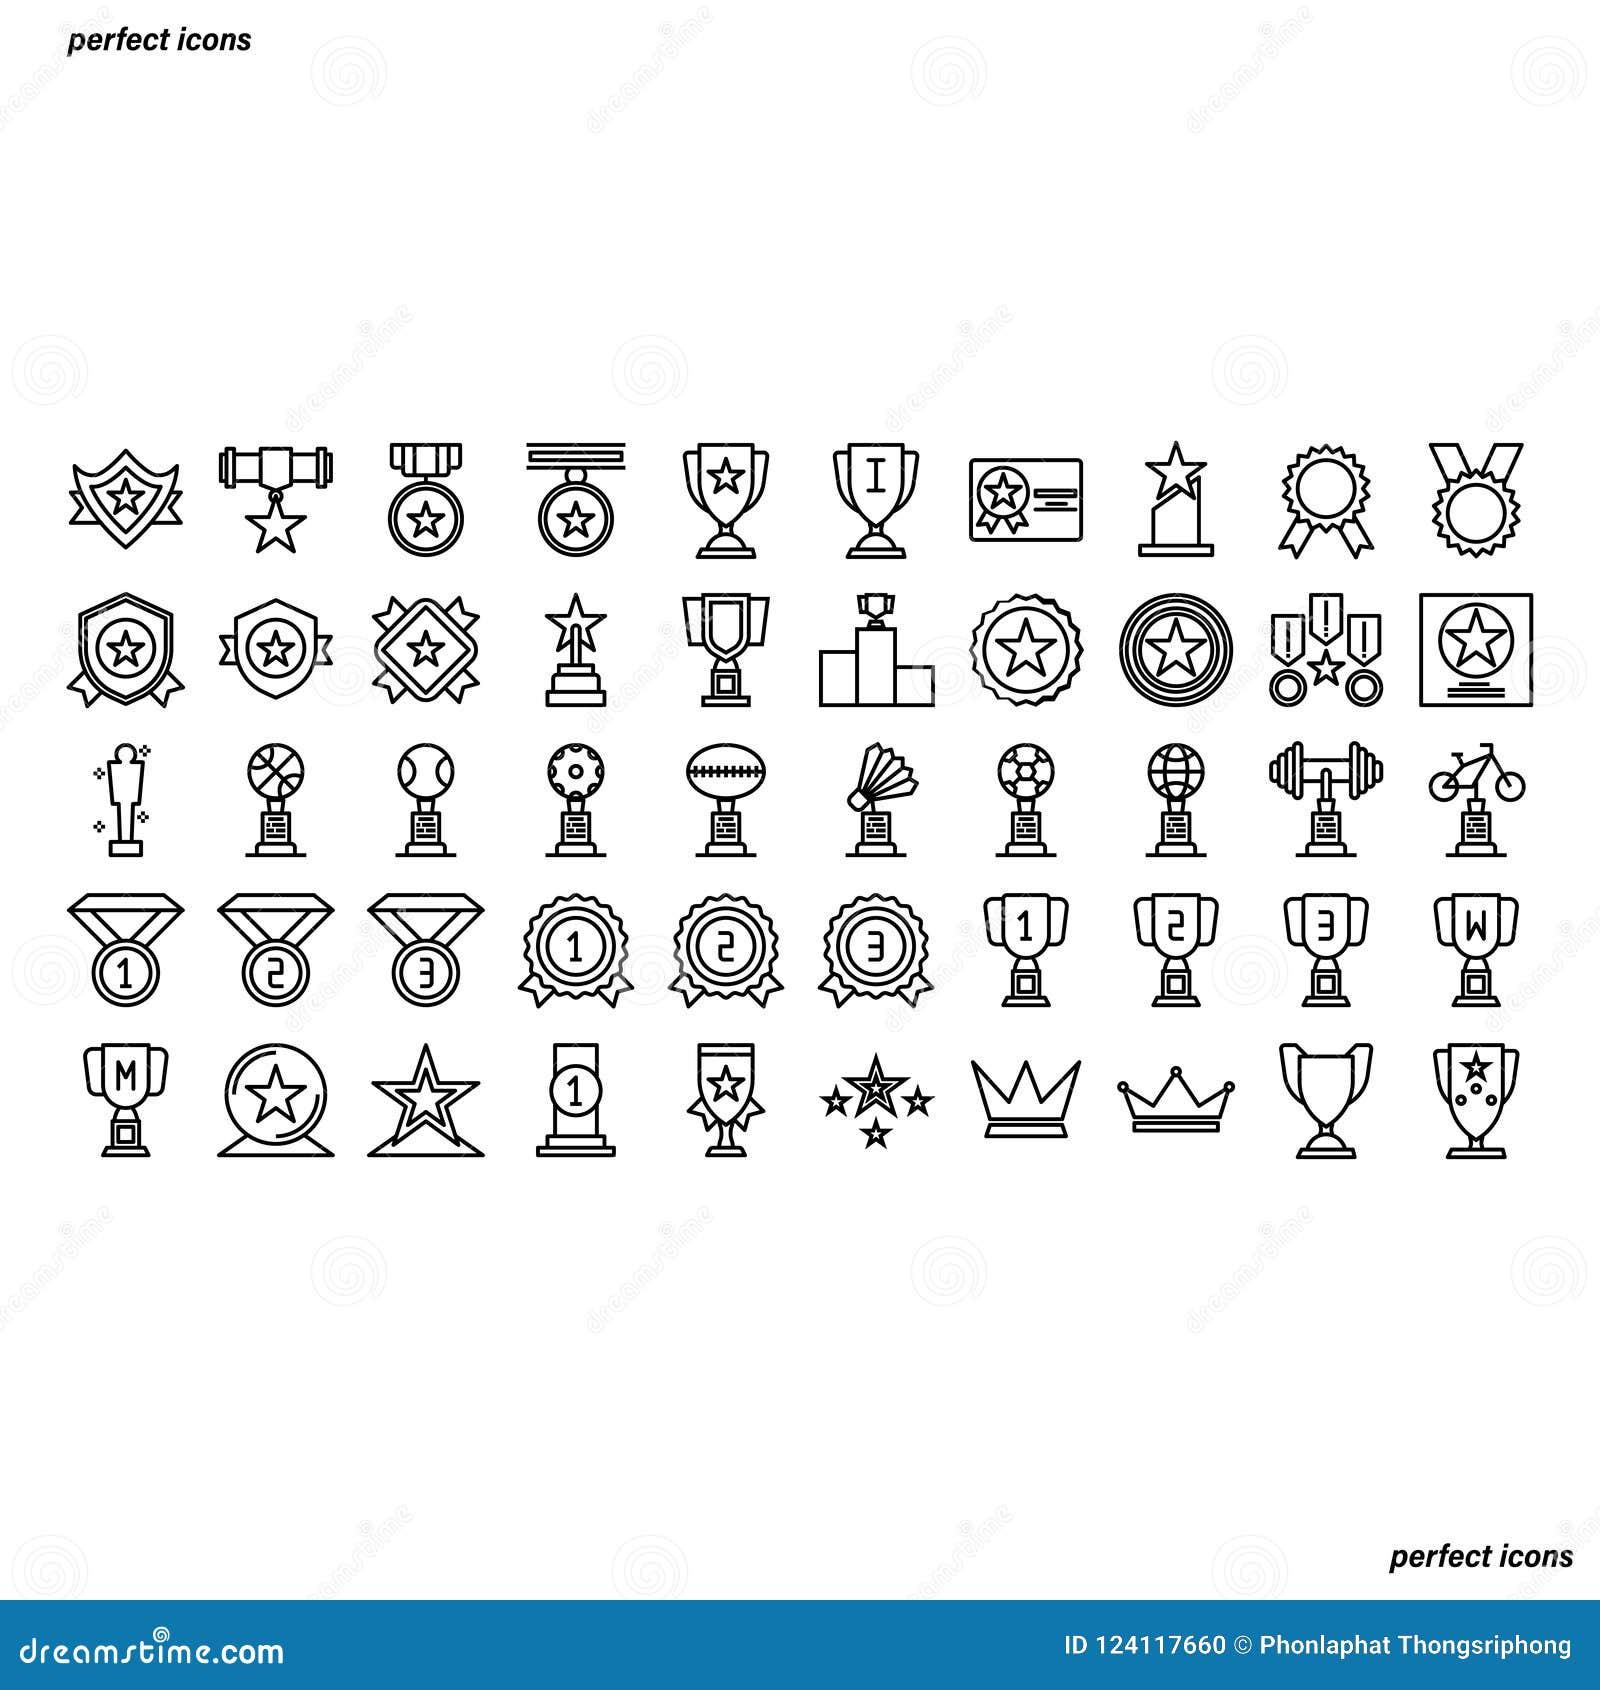 Preis-Entwurfs-Ikonen vervollkommnen Pixel